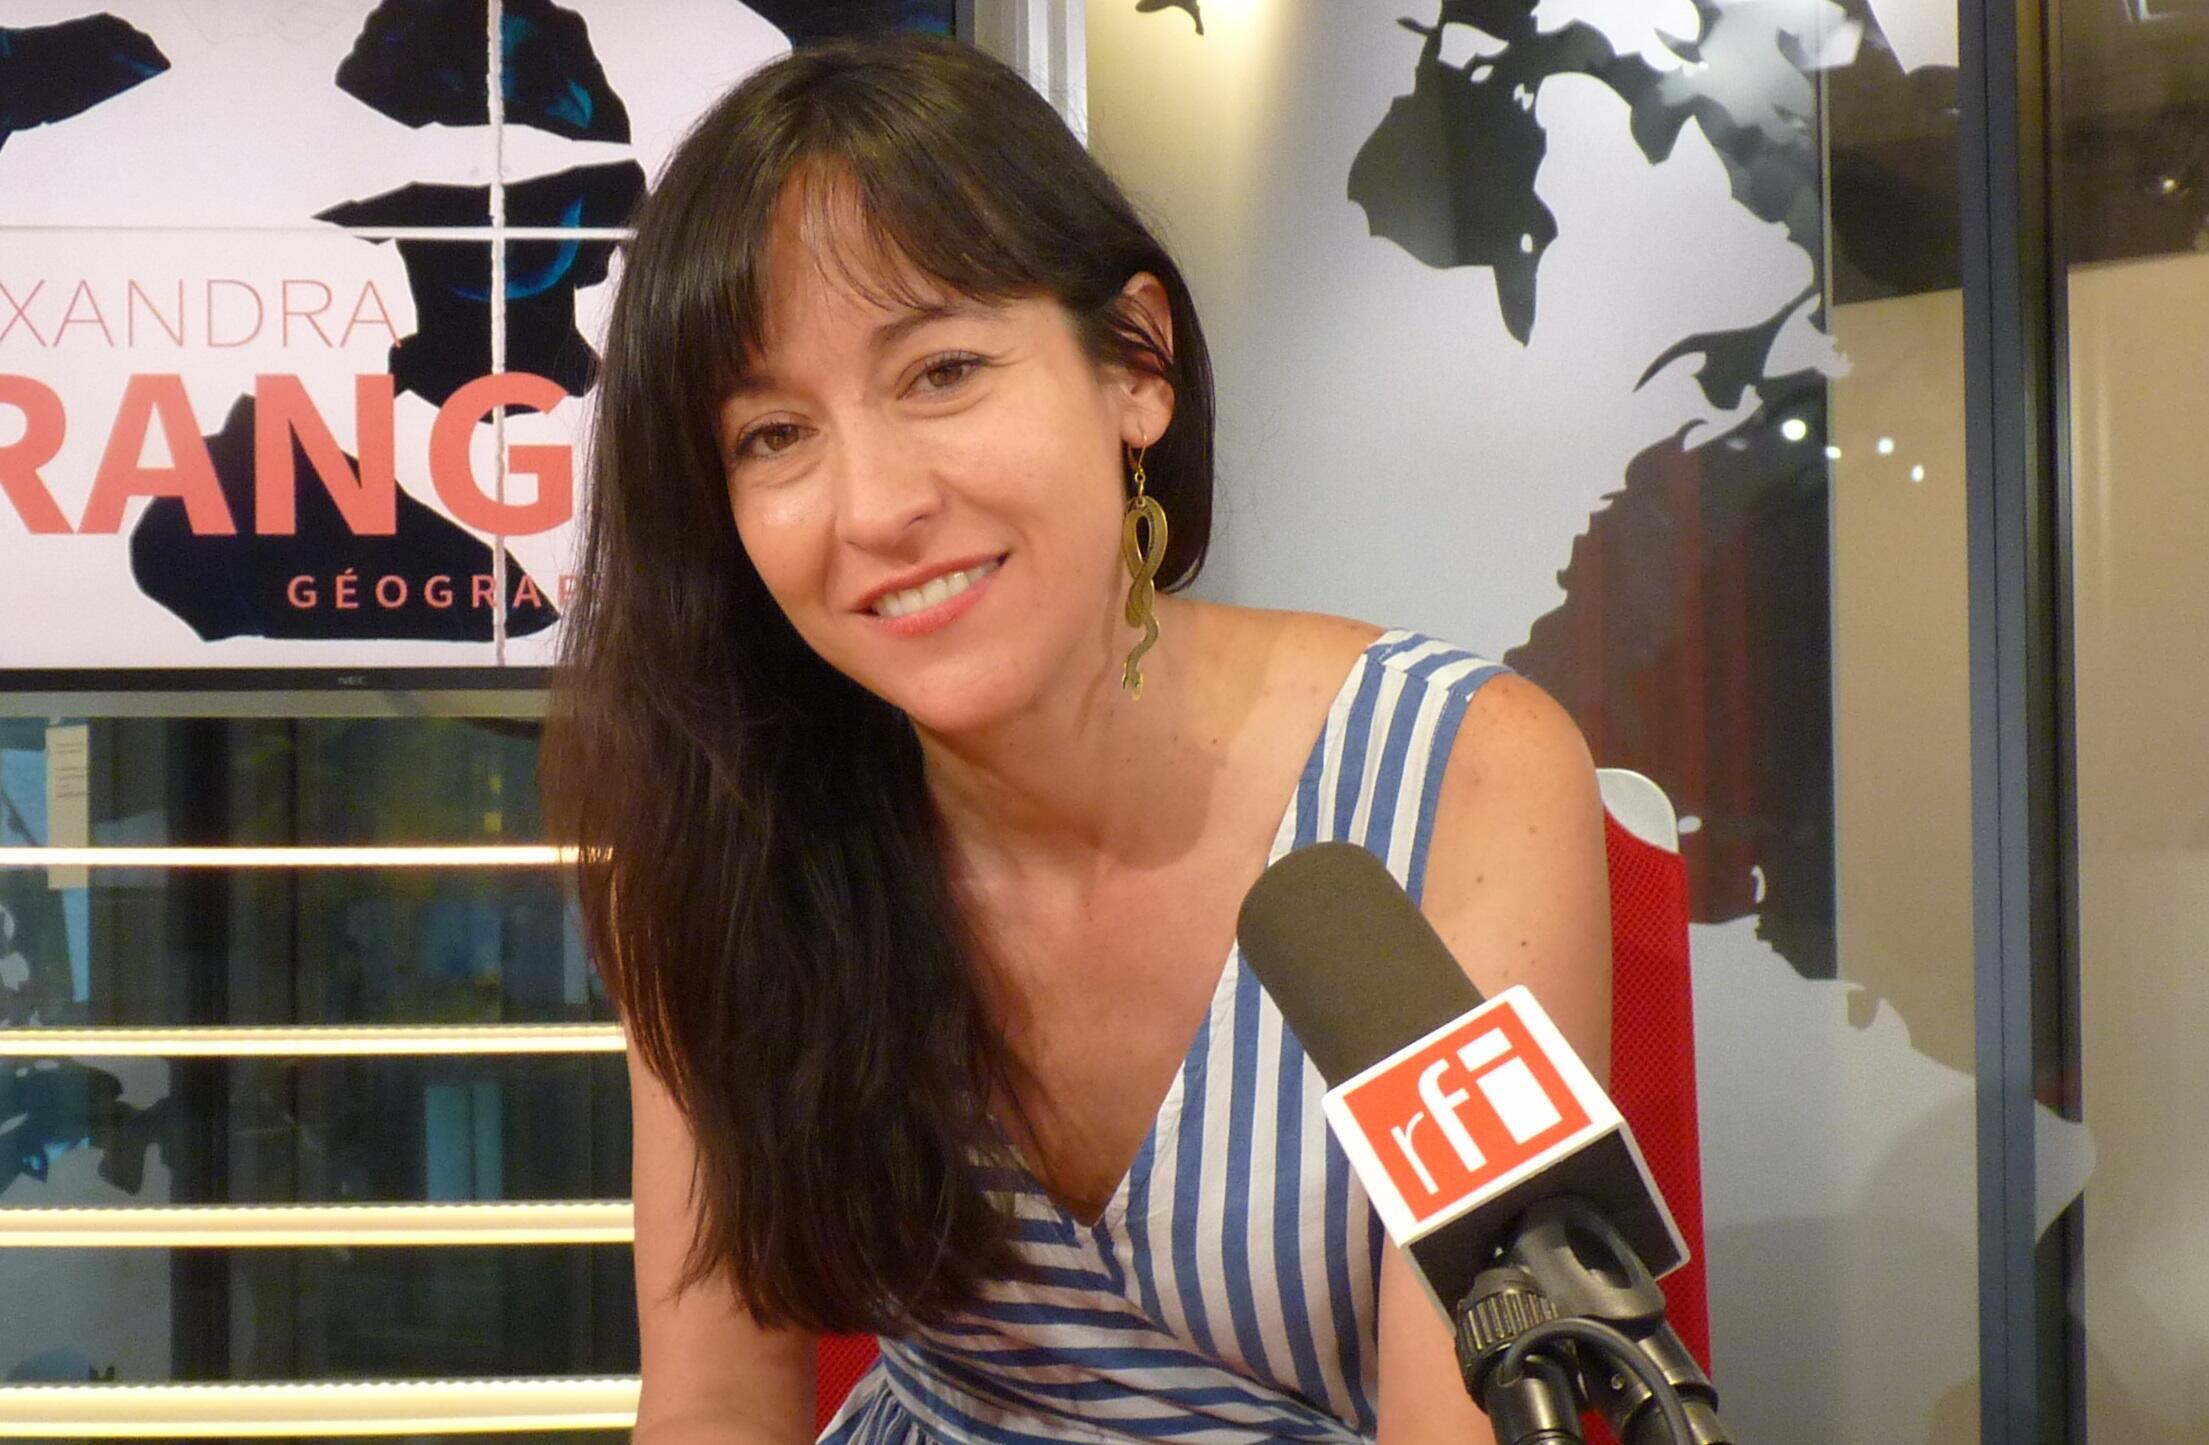 Alexandra Arango en los estudios de RFI